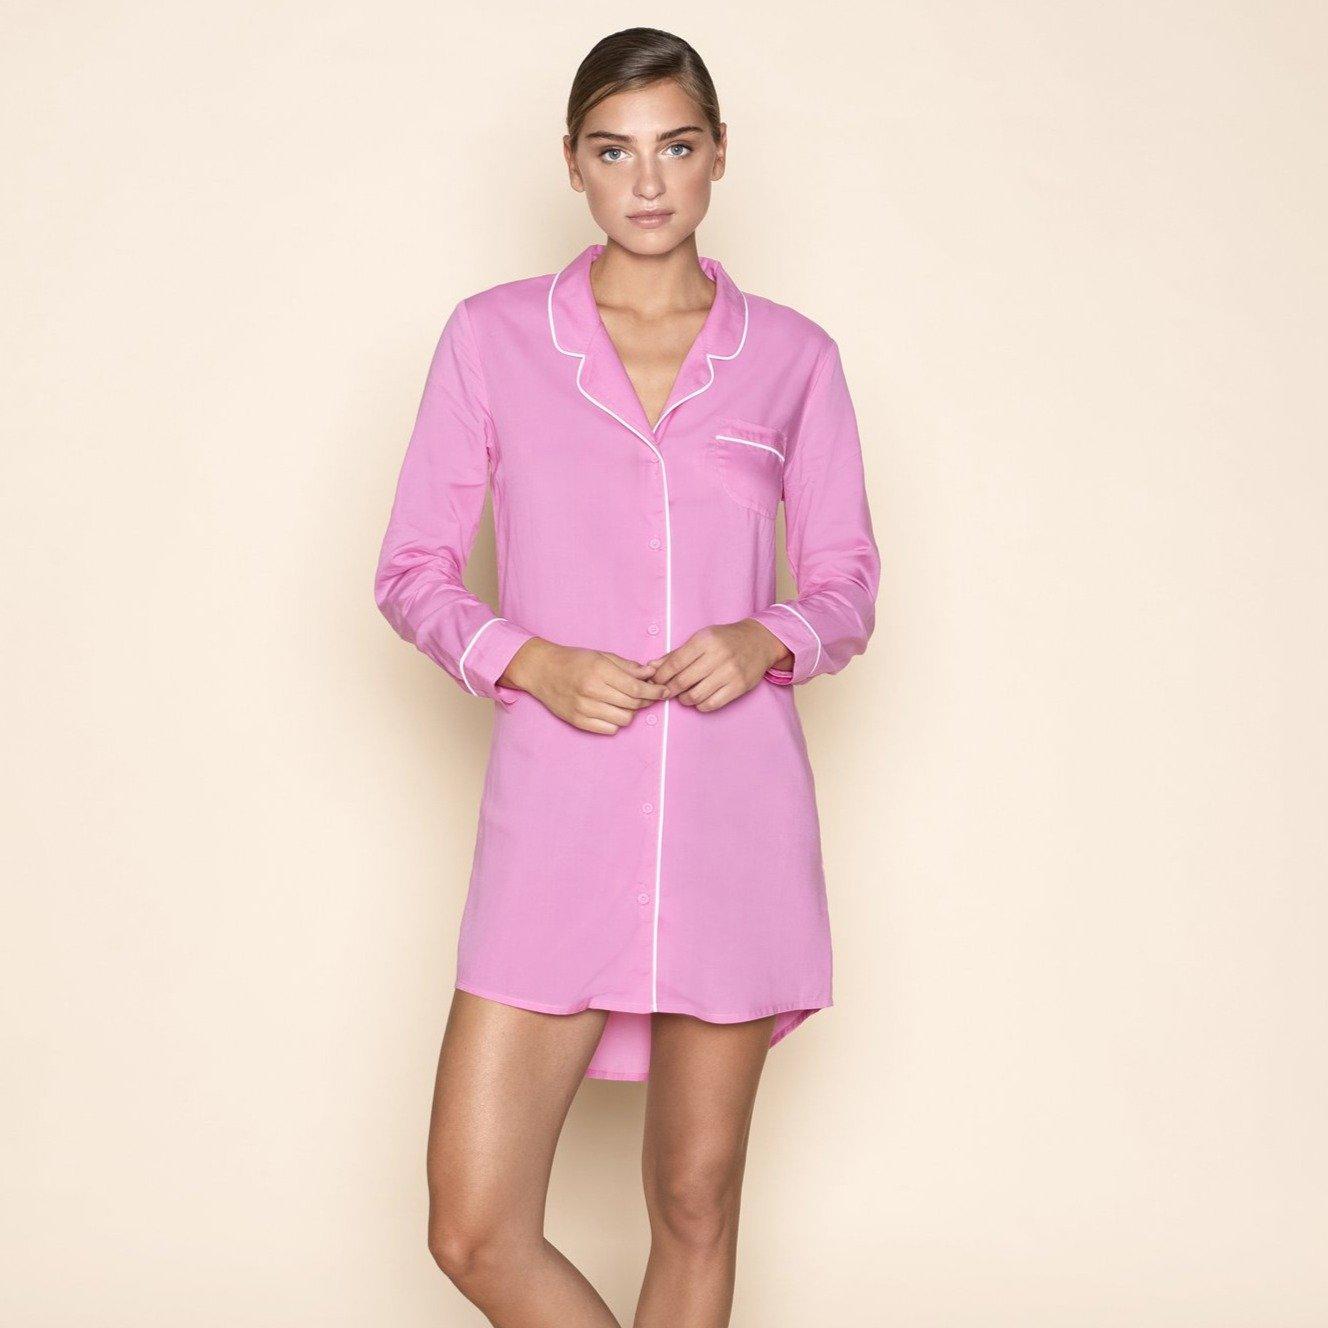 Dress Blouse Bombshell Pink